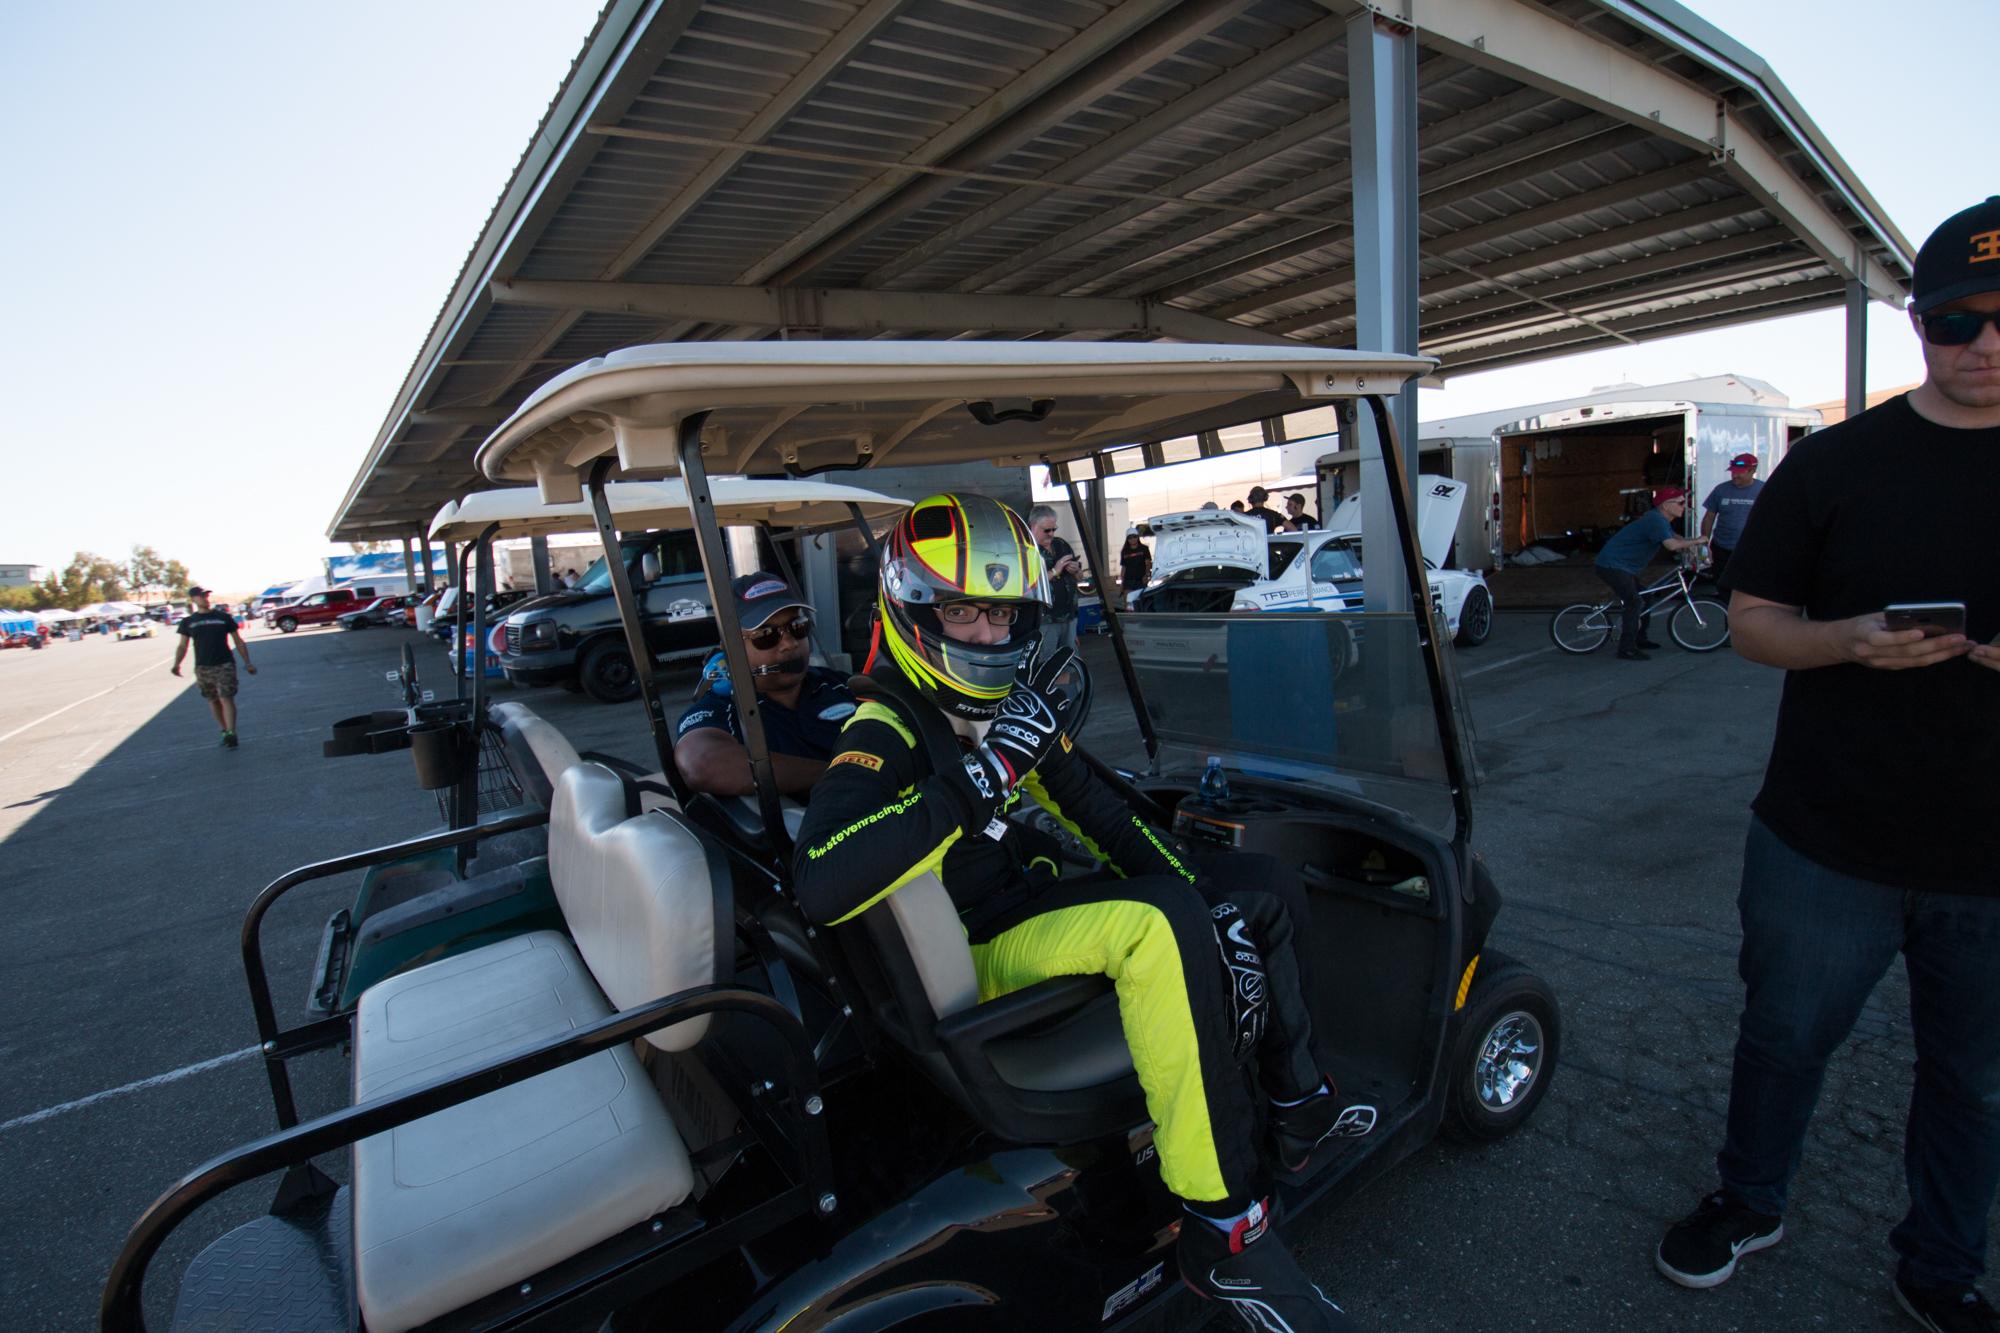 Steven-Racing-20130206-44813.jpg